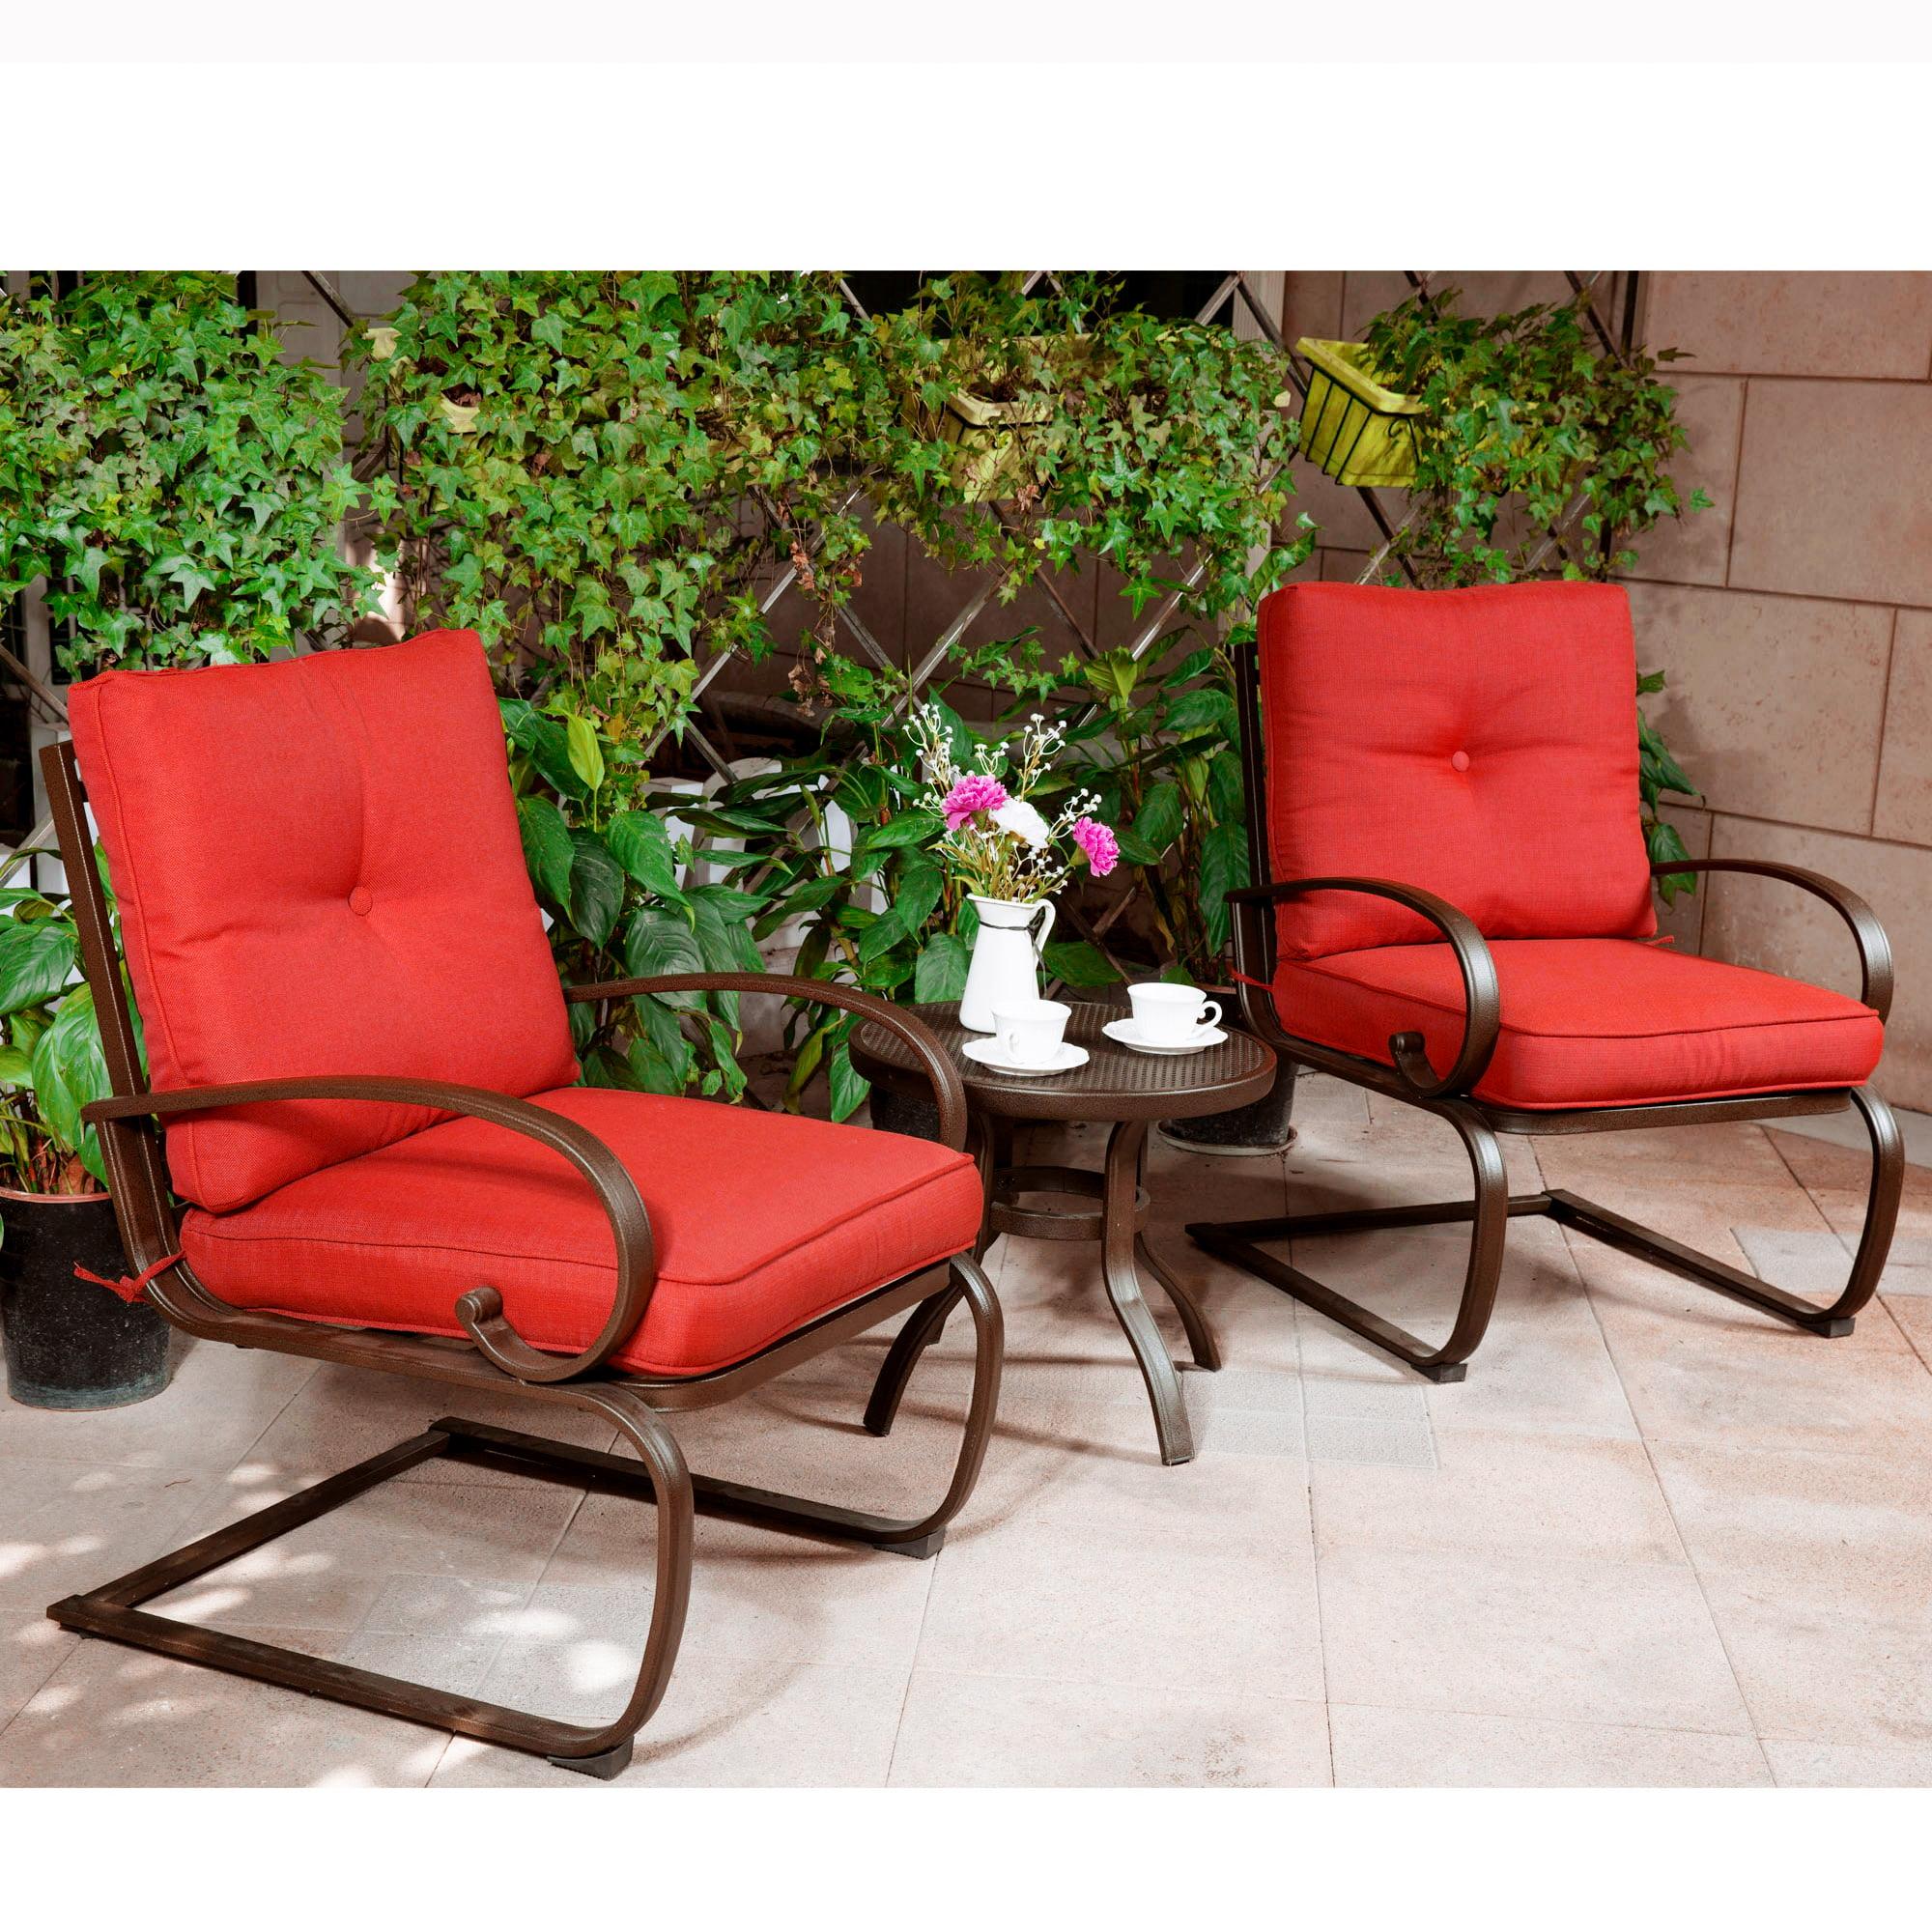 Cloud Mountain Bistro Table Set Outdoor Bistro Set Patio Cafe Furniture Seat, Wrought Iron Bistro Set, Garden Set with... by Cloud Mountain